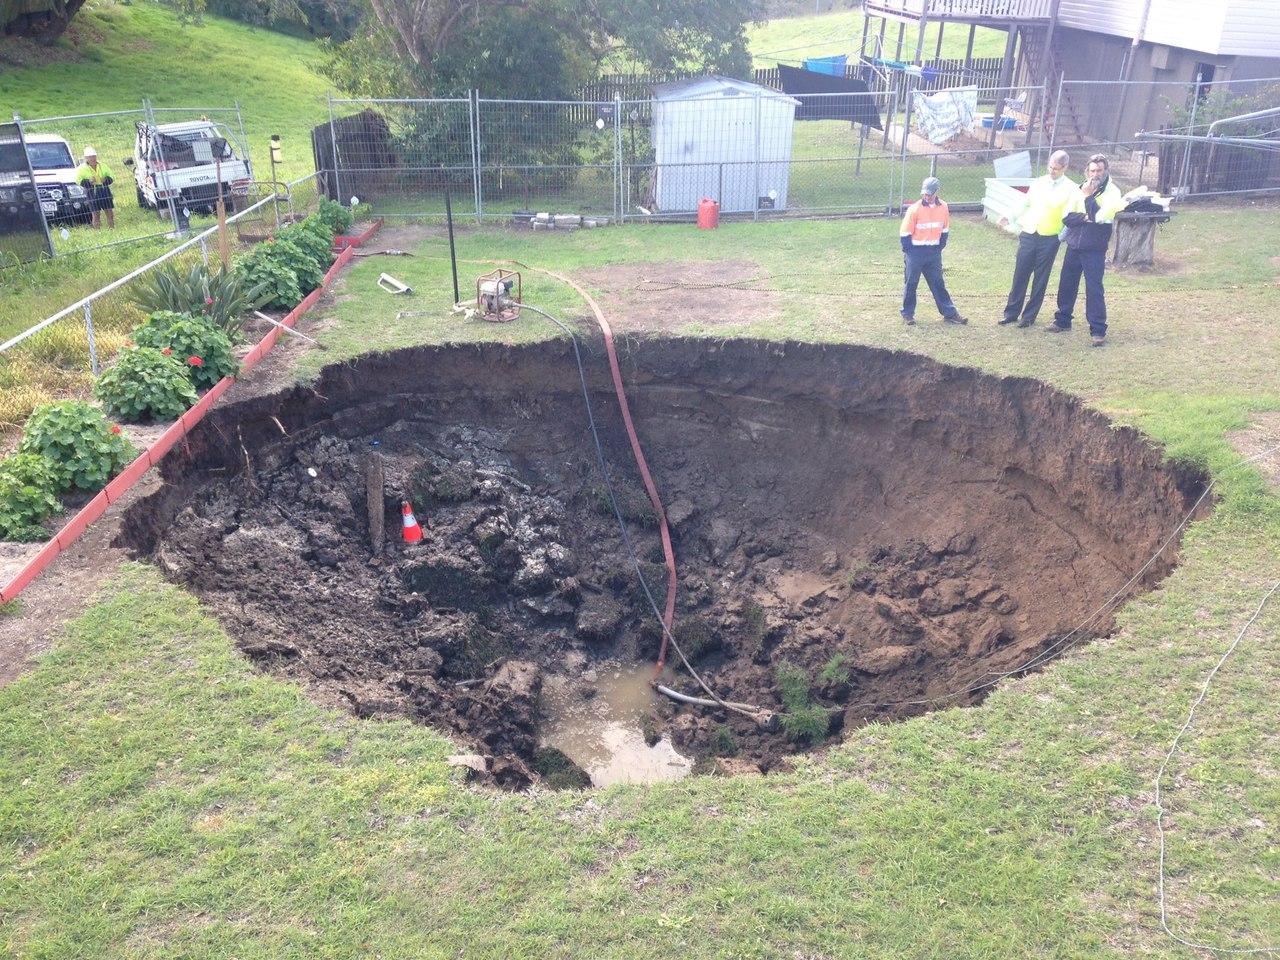 In Australia The Courtyard Formed A Sinkhole Earth